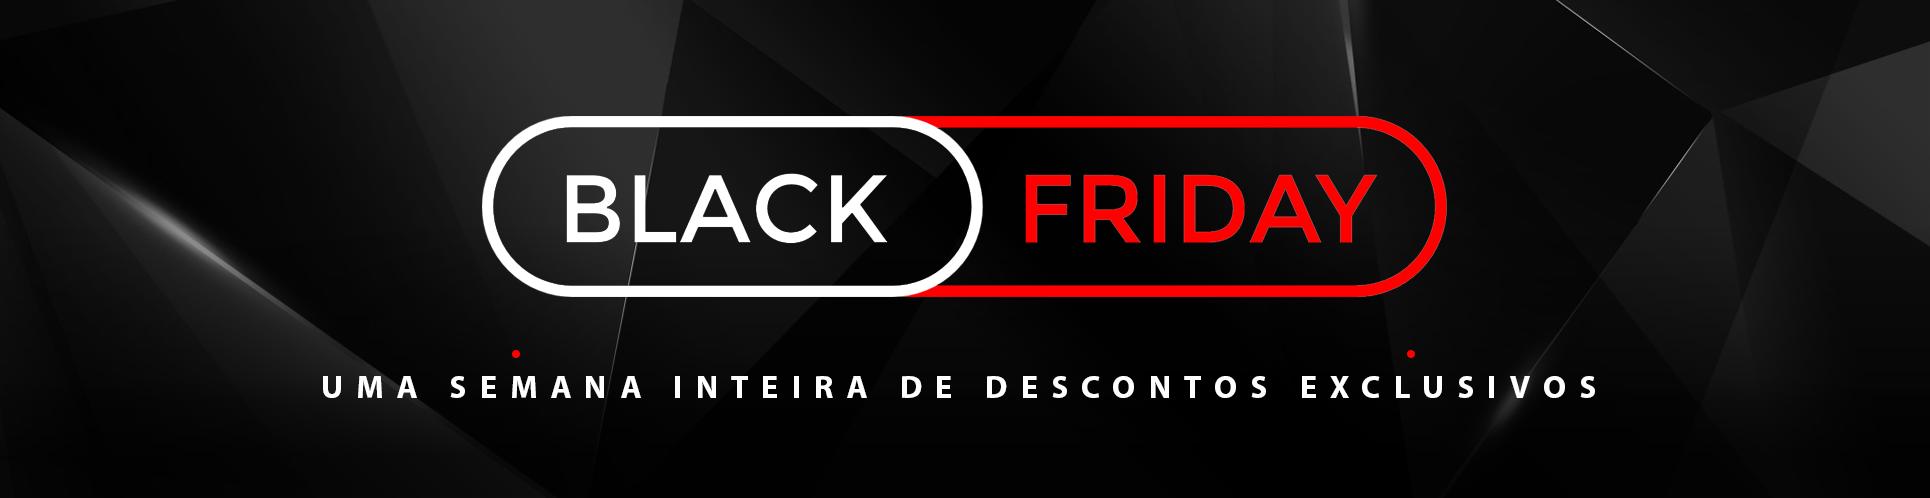 Black FridayPrincipal